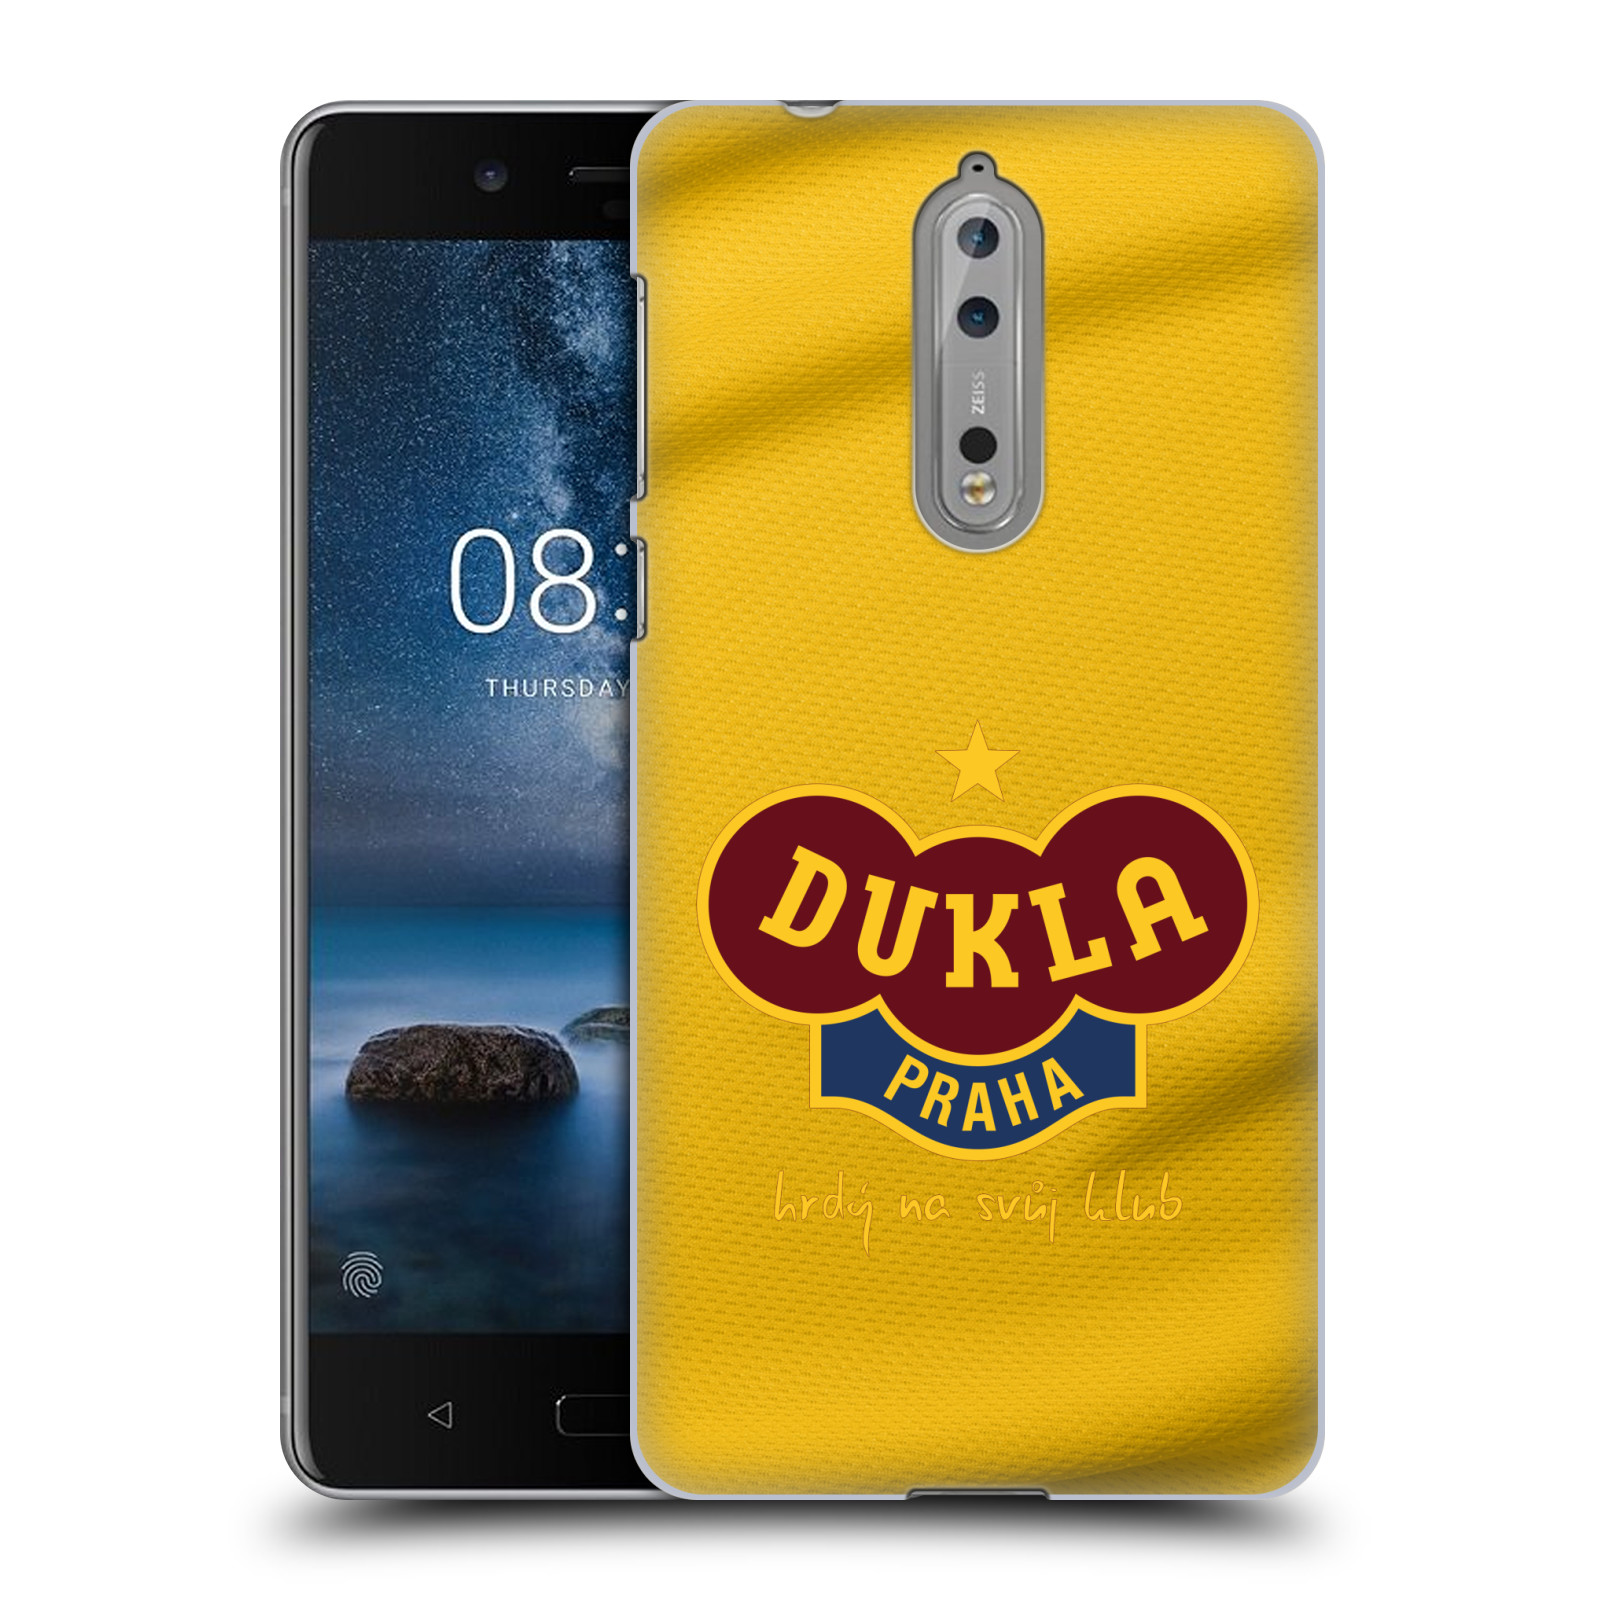 Plastové pouzdro na mobil Nokia 8 - FK Dukla Praha - Žlutý dres (Plastové pouzdro na mobil Nokia 8 - FK Dukla Praha - Žlutý dres)